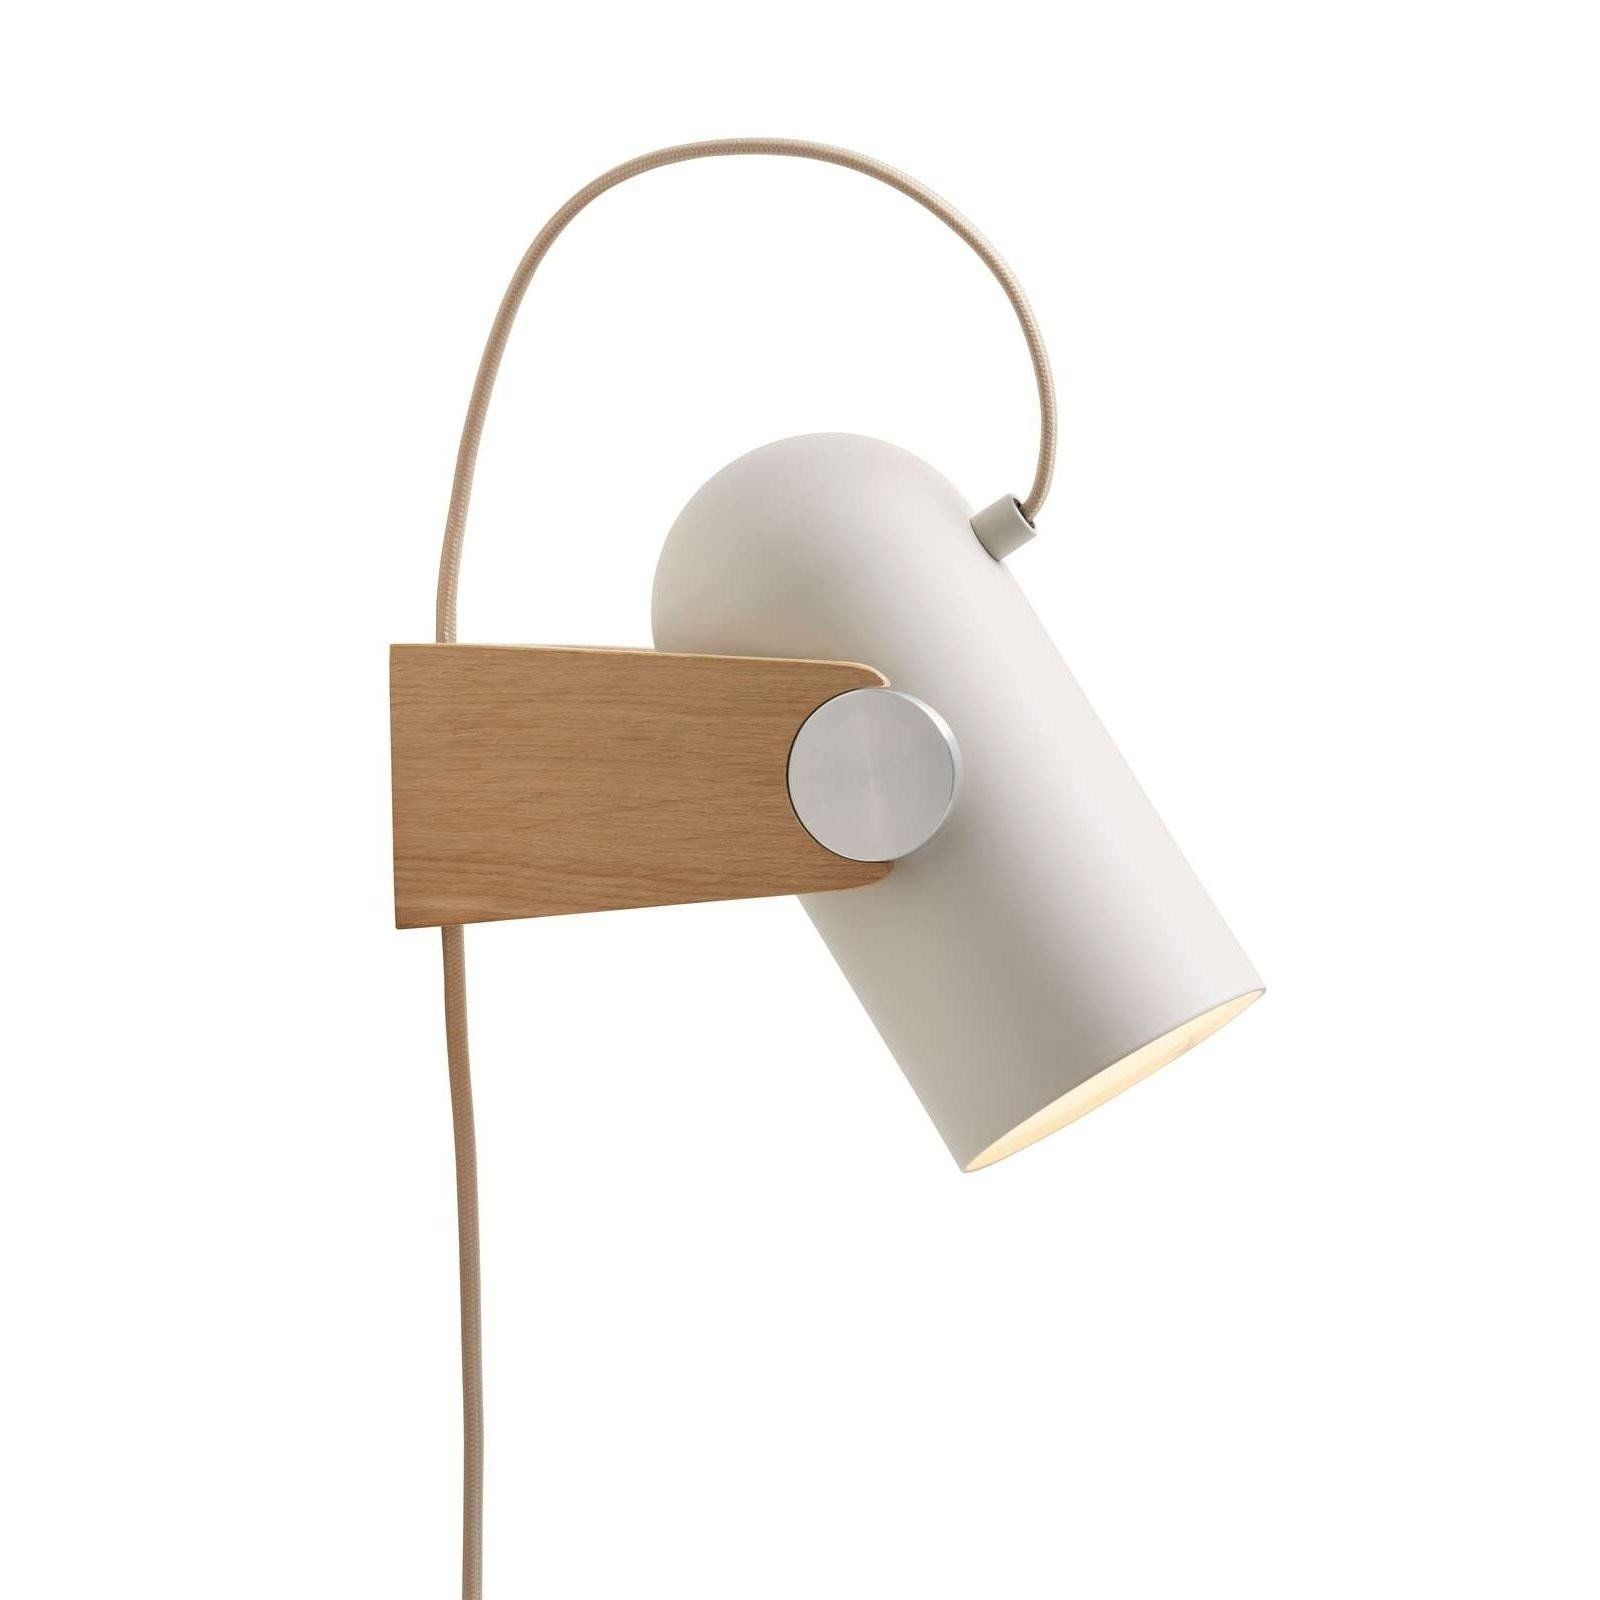 Carronade Lampe de table applique murale